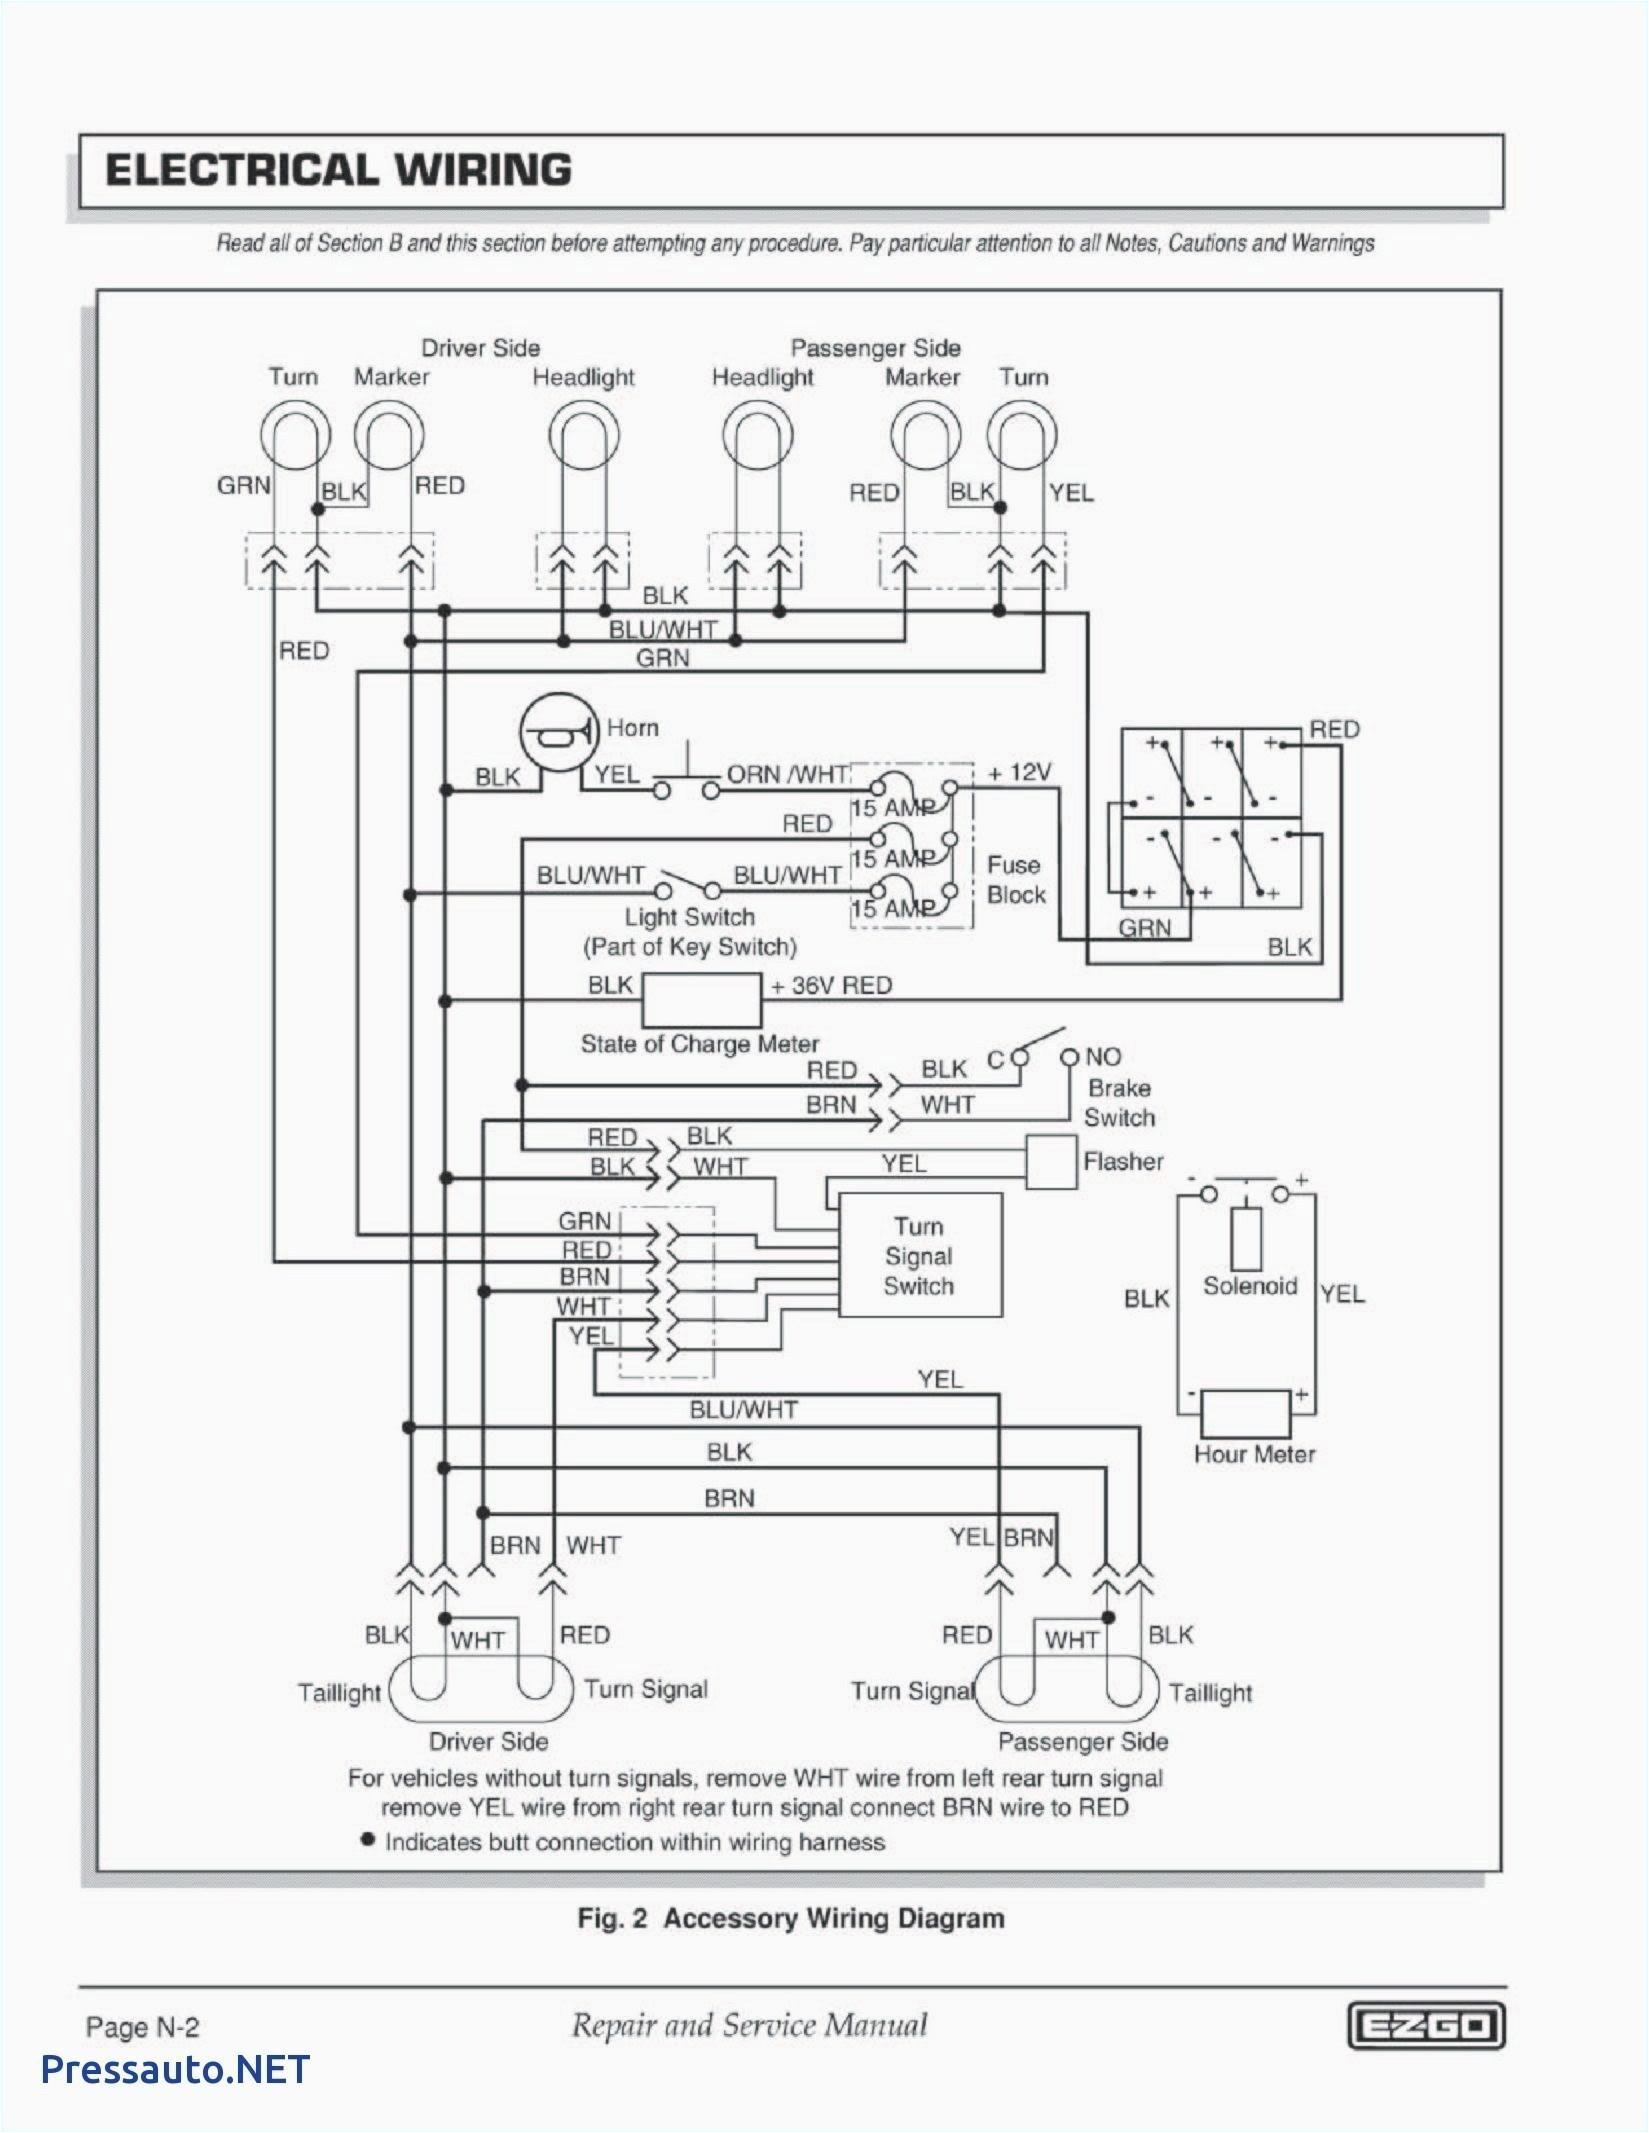 ezgo golf cart wiring harness wiring diagram sheet ezgo txt gas wiring harness ezgo wiring harness